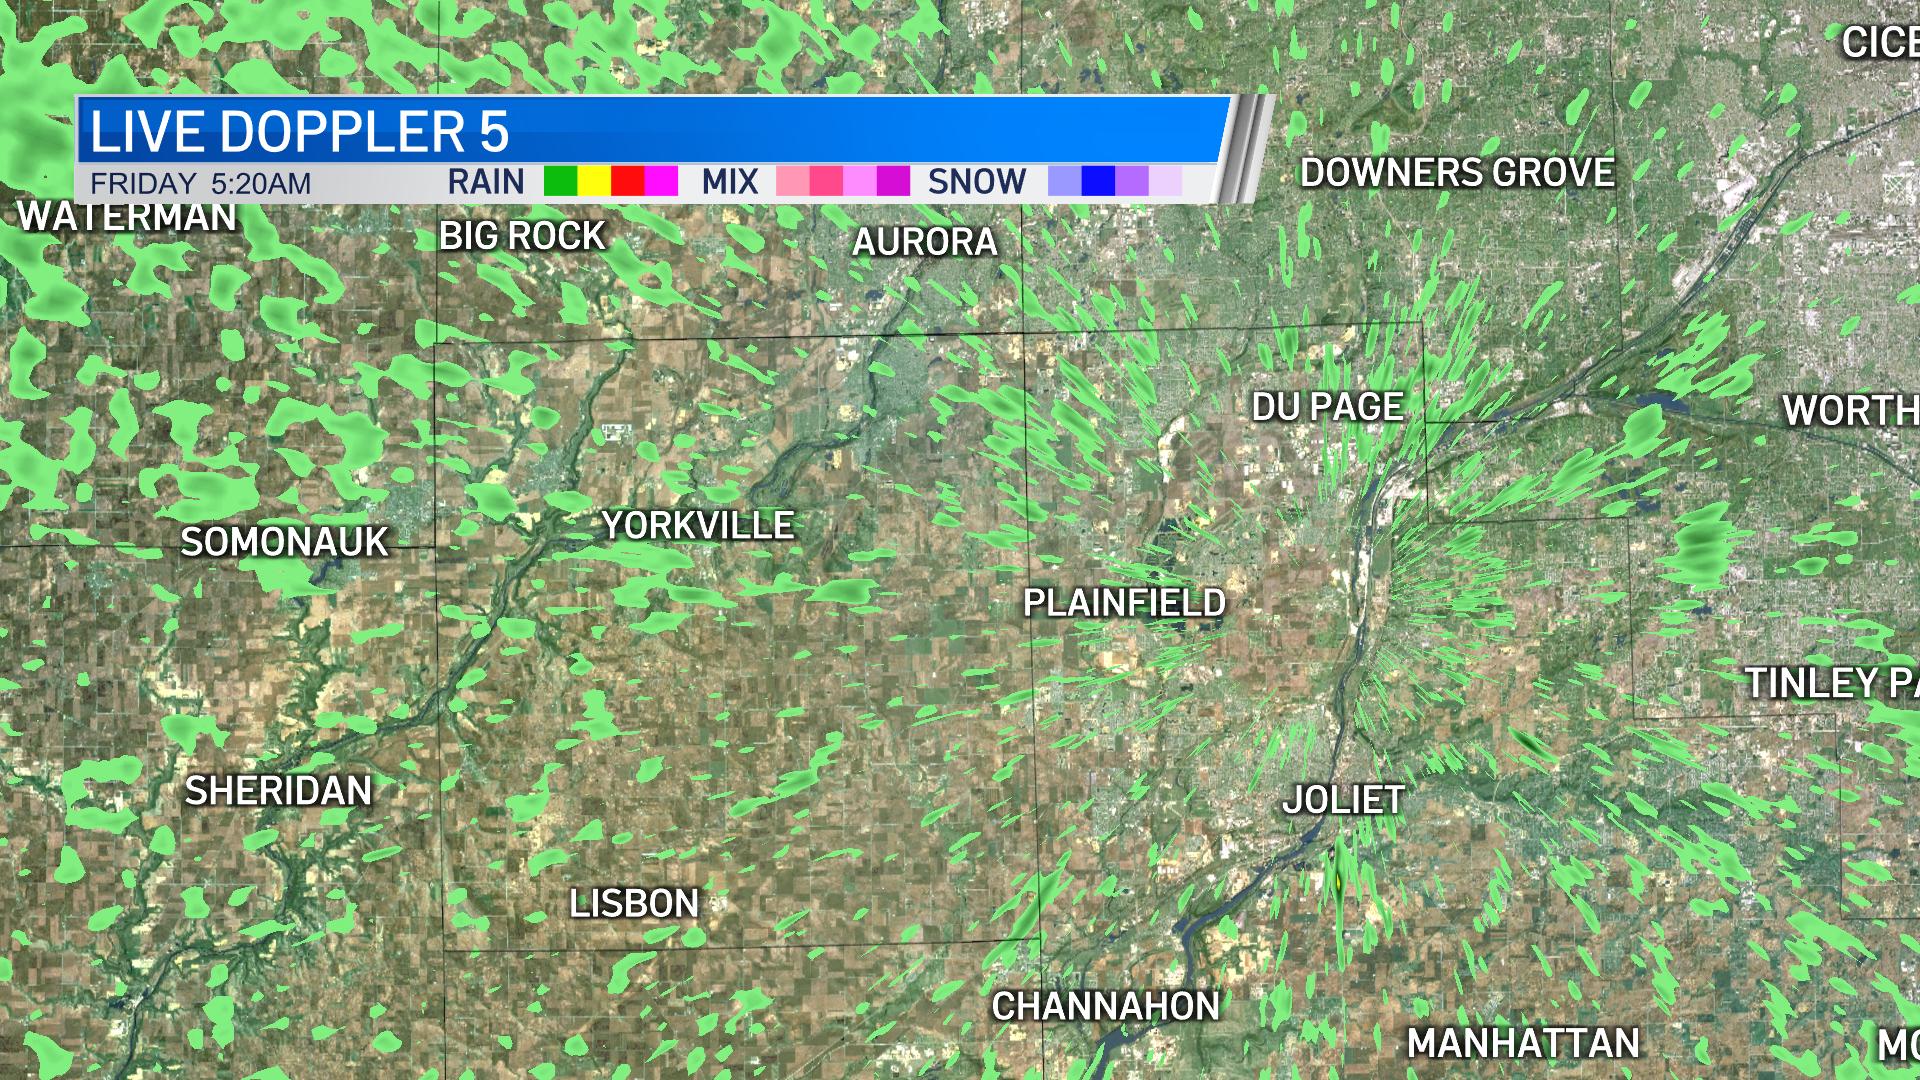 Live Doppler 5 Kendall County